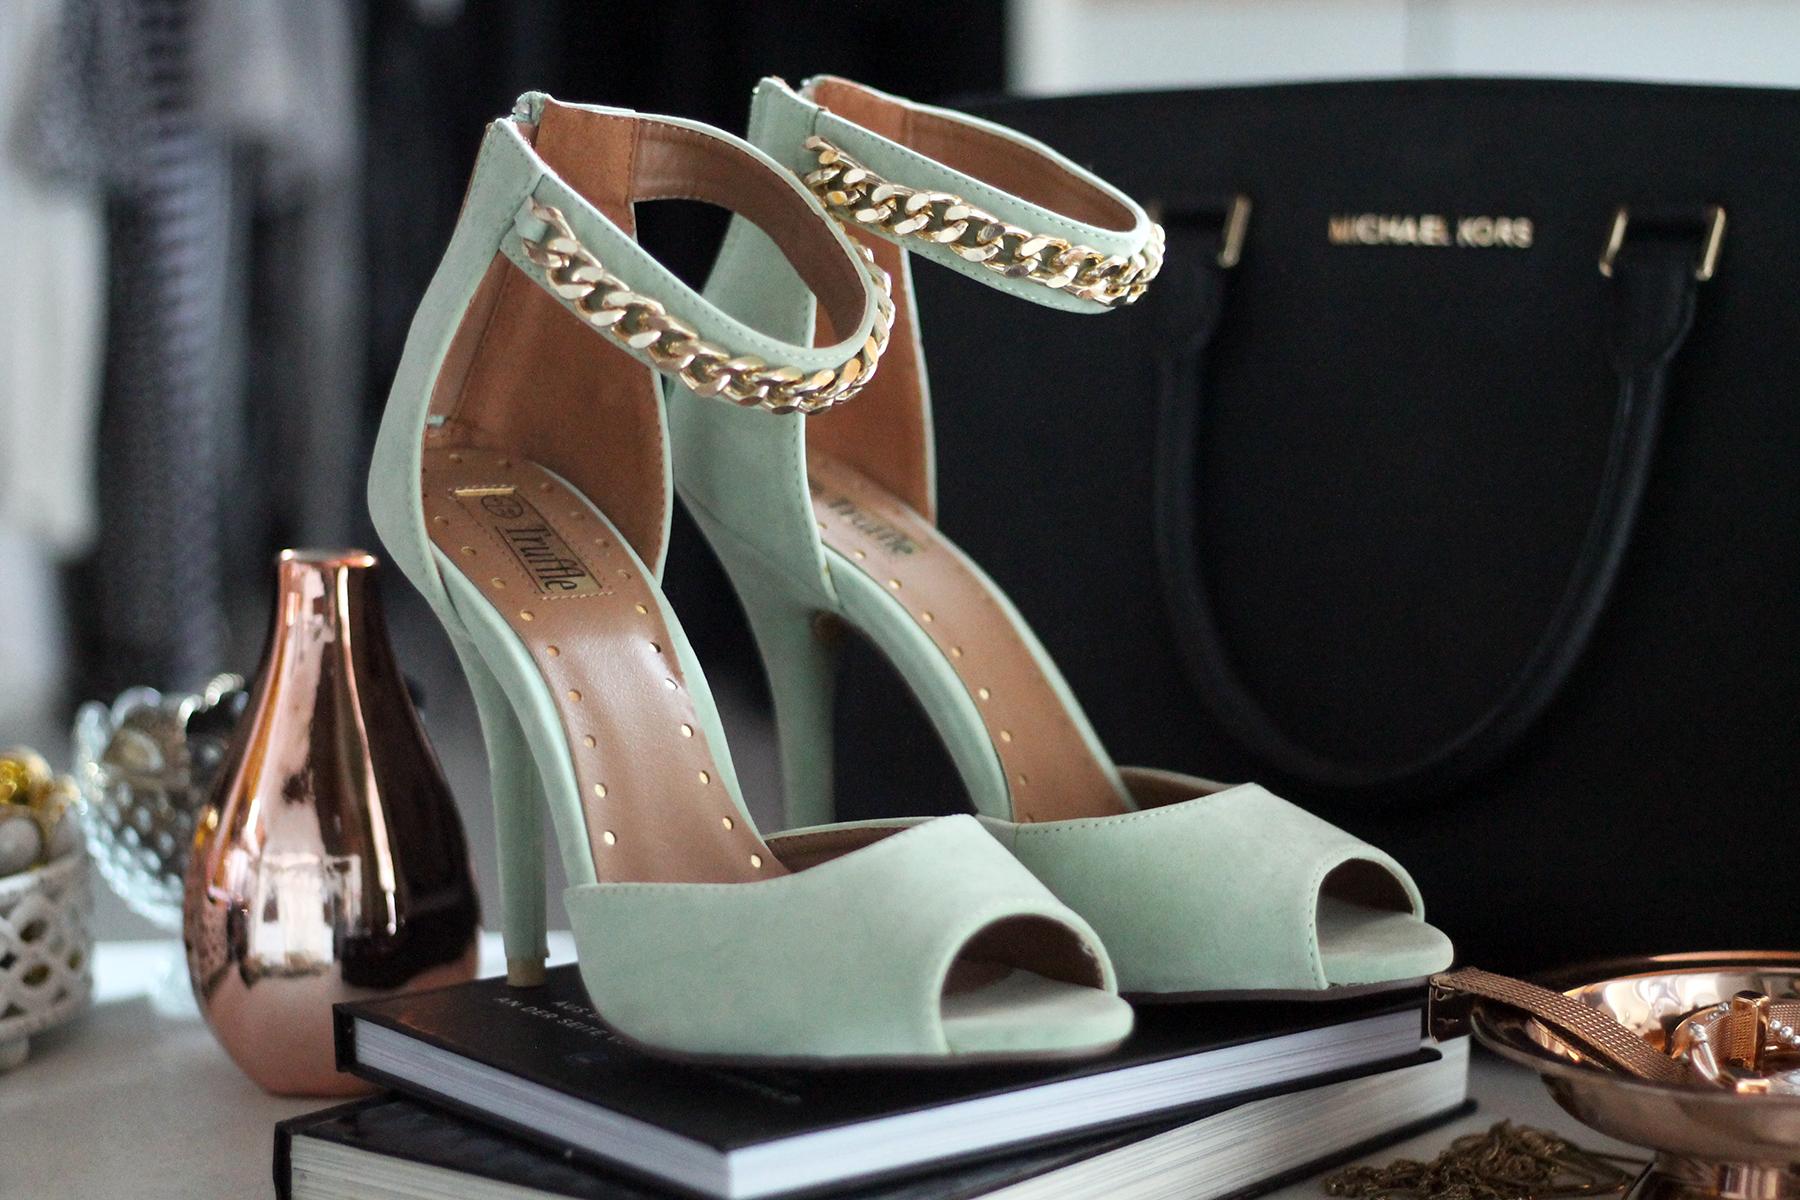 highheels-modeblog-fashionblog-ankleidezimmer-home-room-schrank